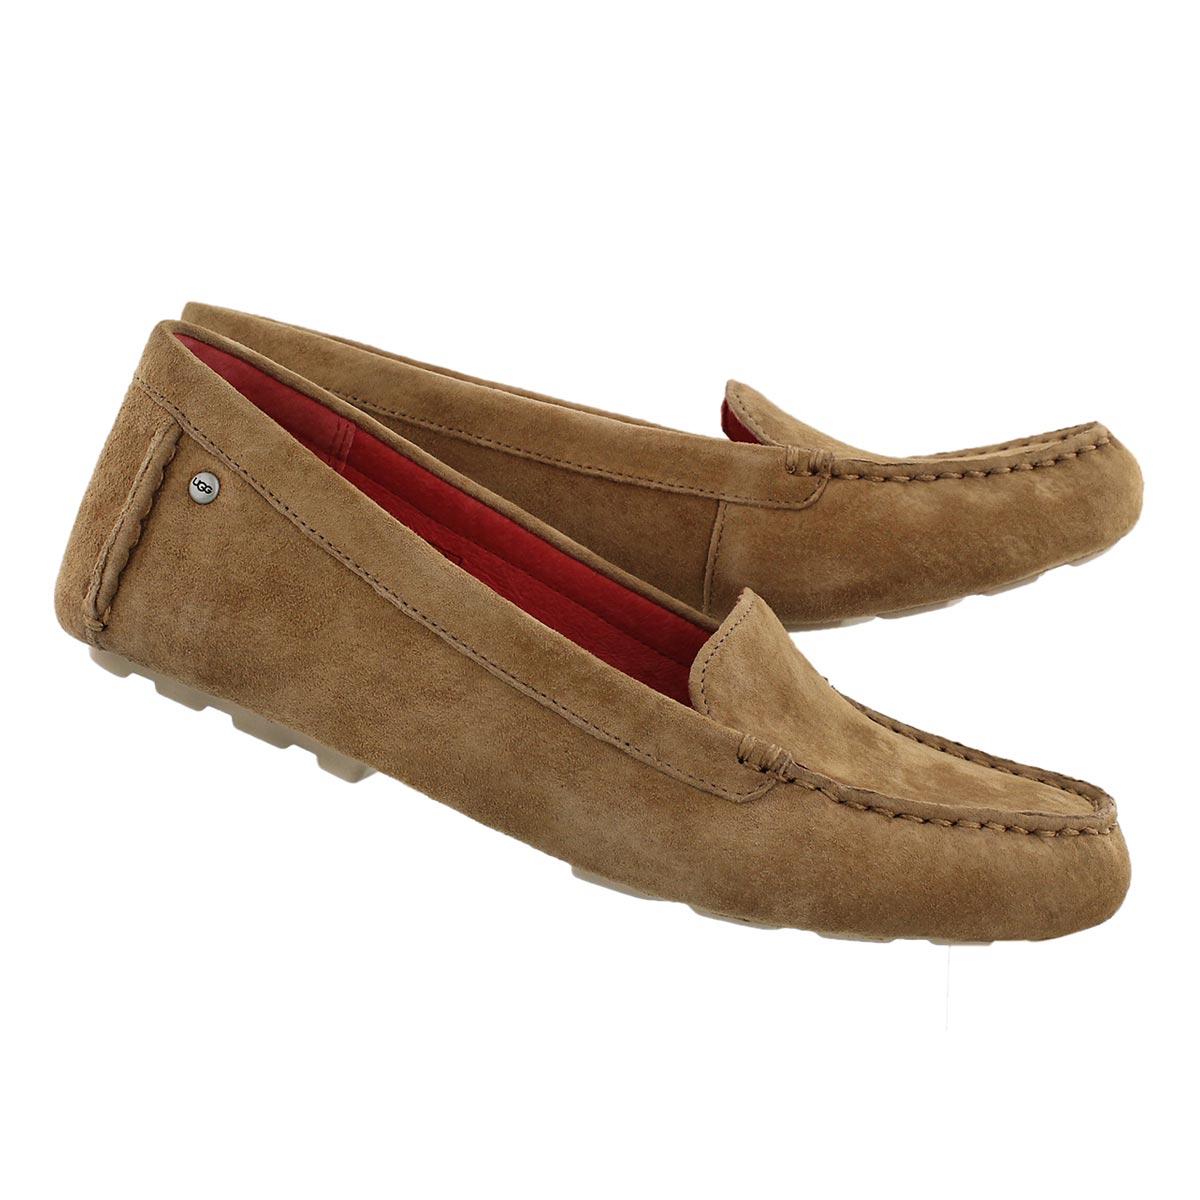 Milana Shoes Australia